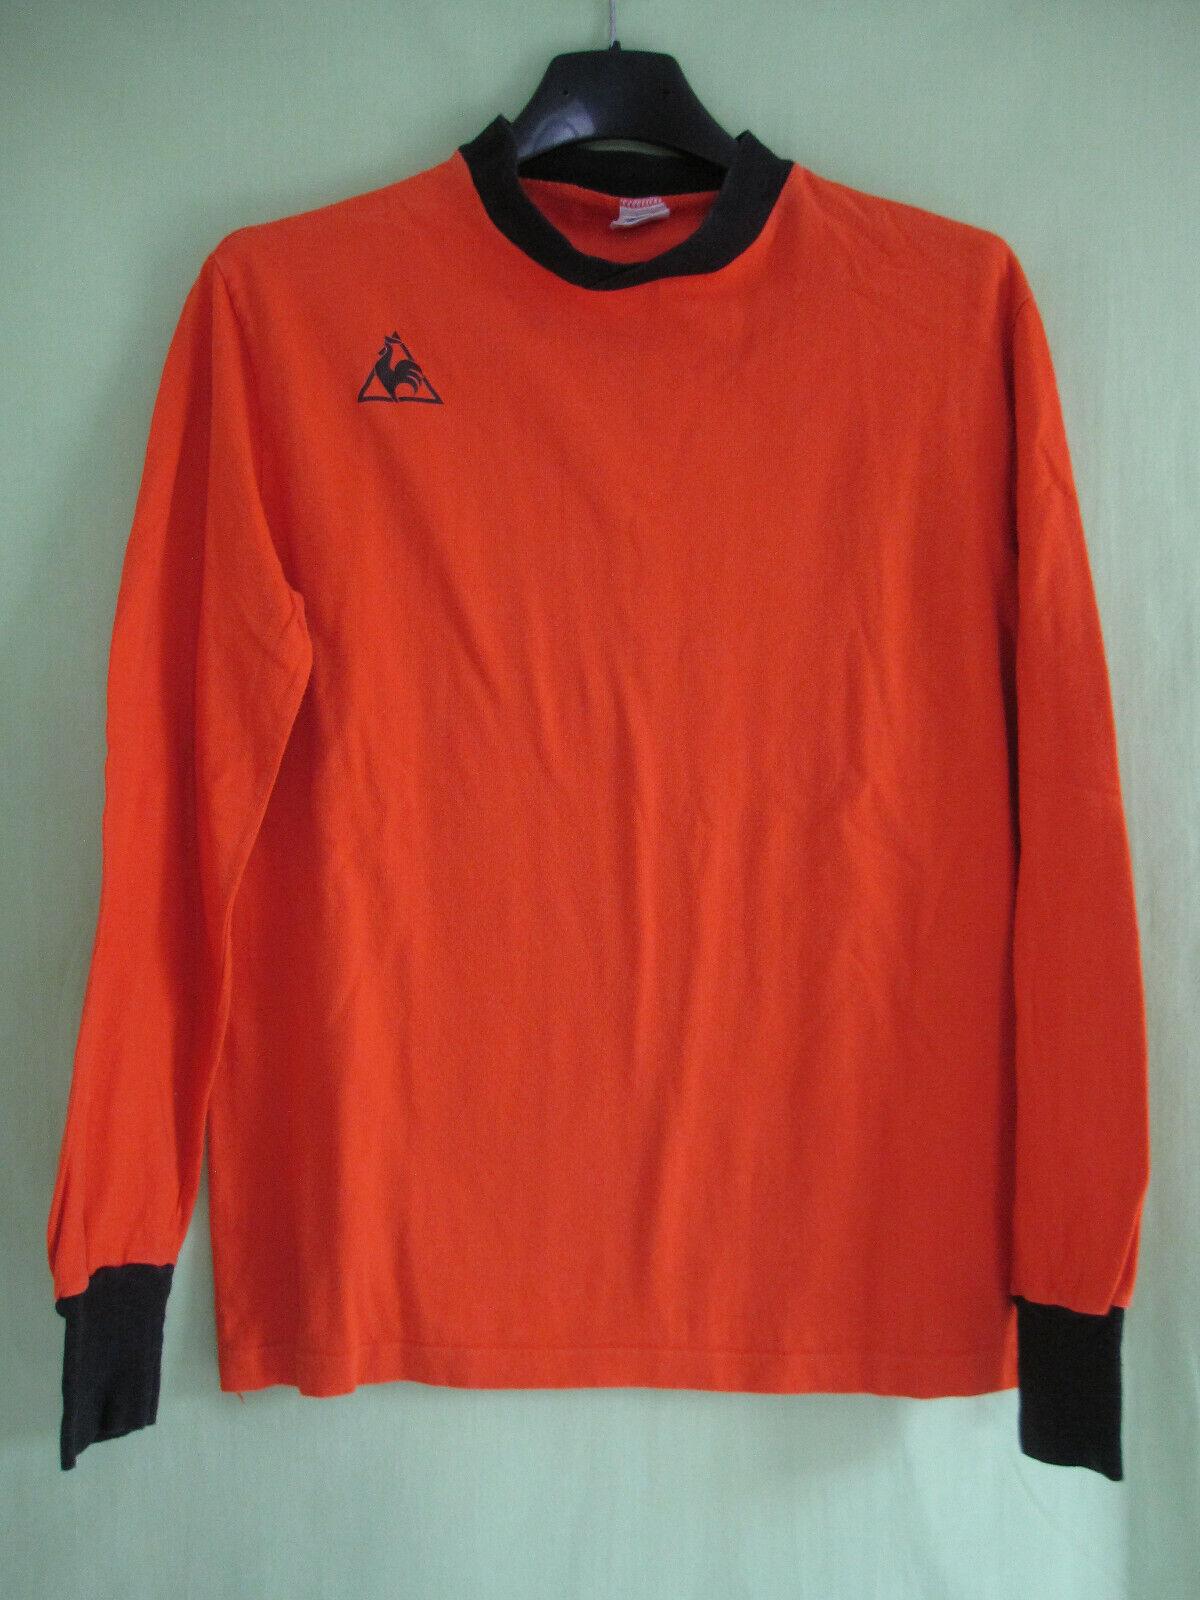 Maillot Le Coq Sportif Vintage naranja 70'S Coton Made  in France Shirt - S  orden ahora disfrutar de gran descuento